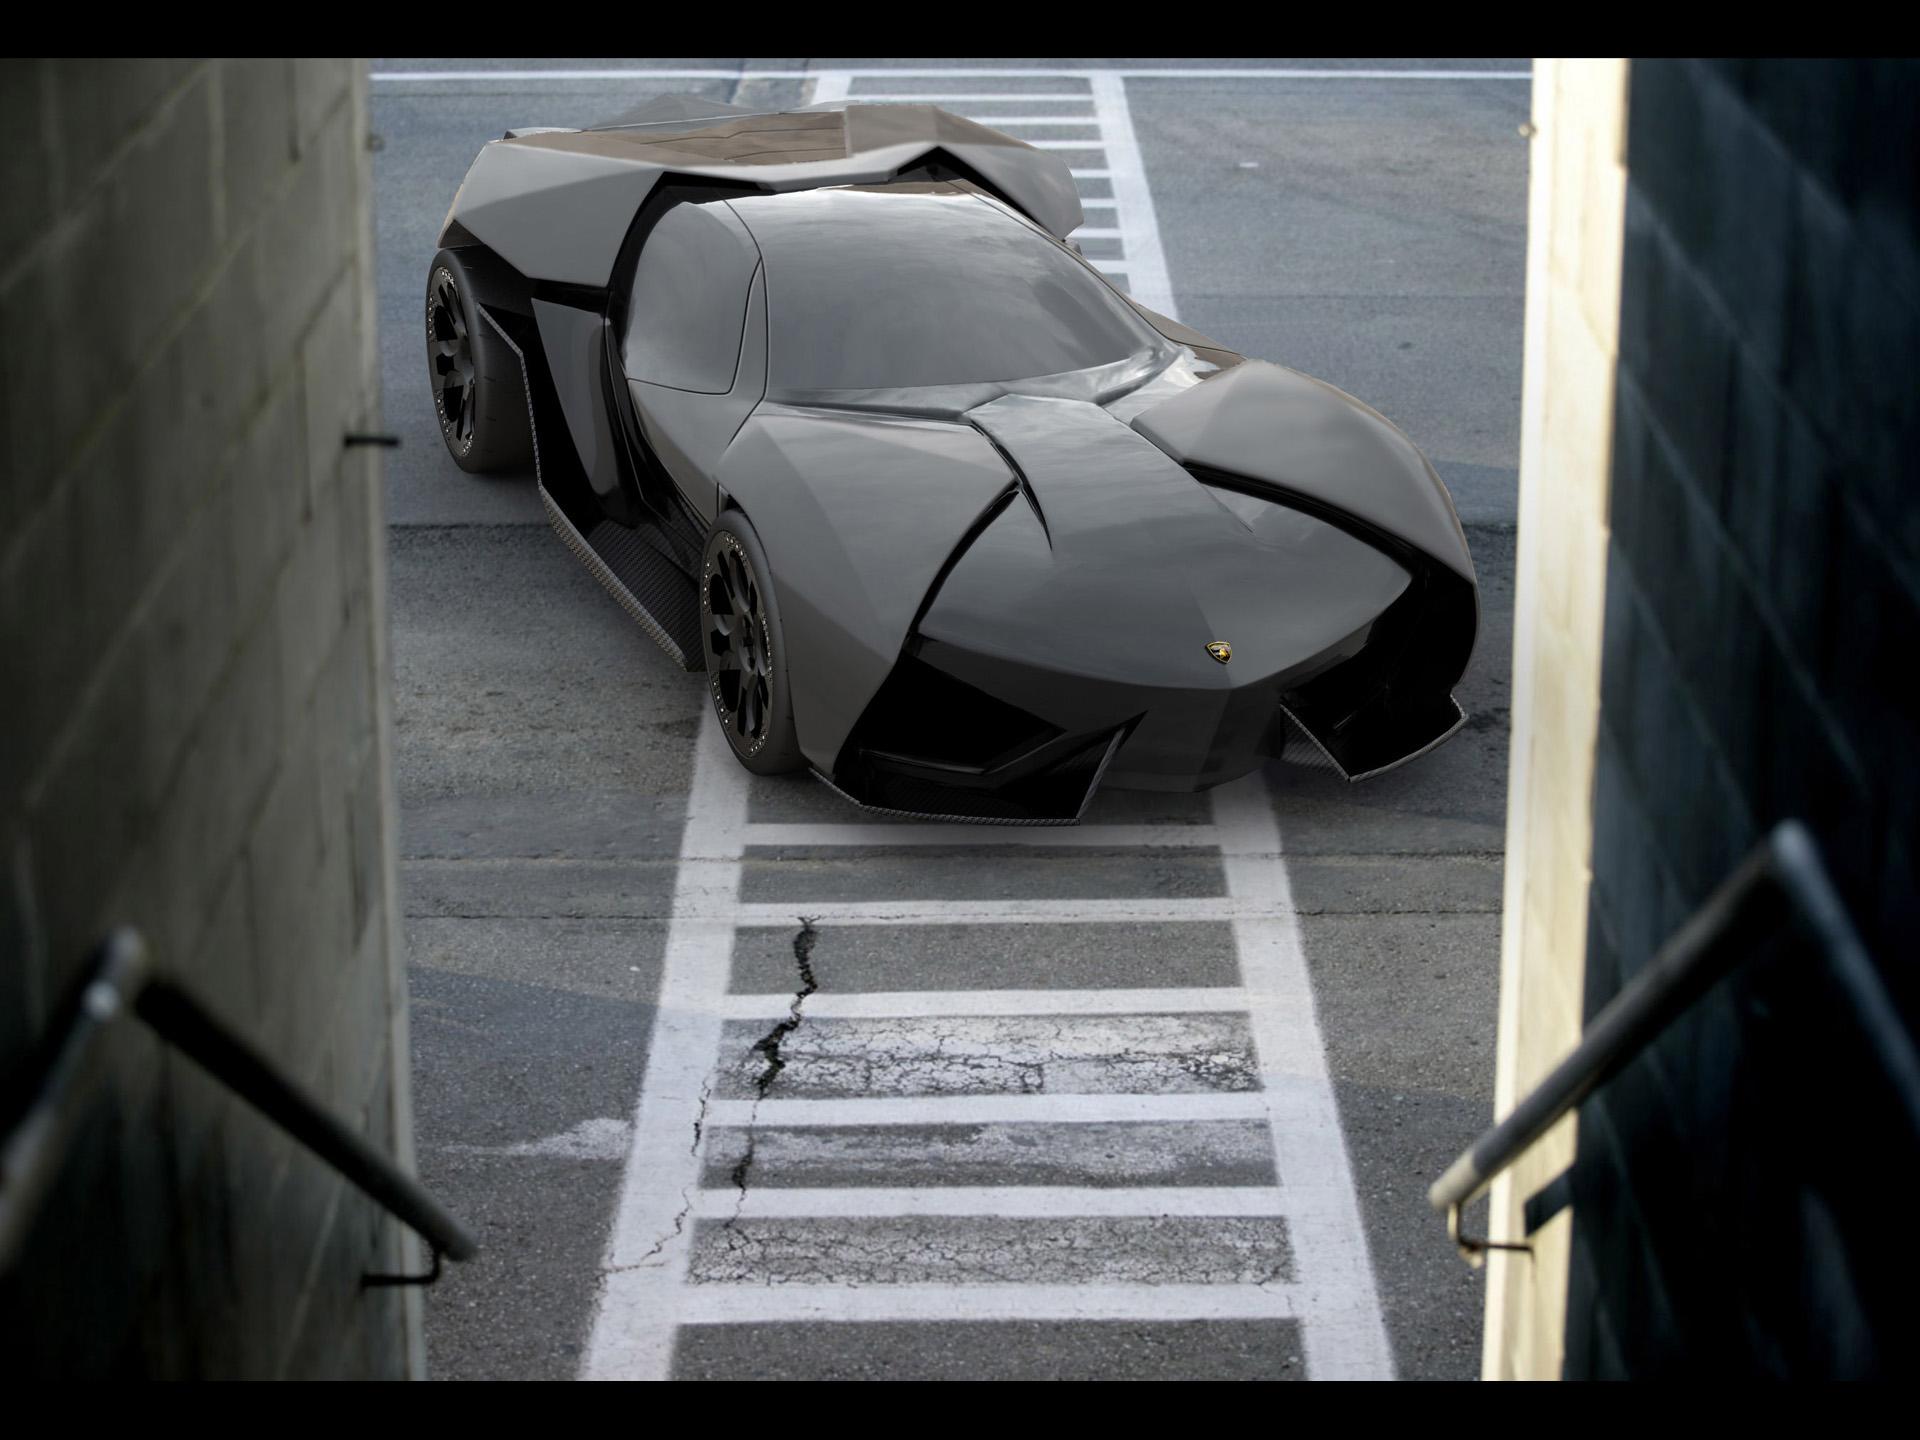 lamborghini-concept-car-2-the-dark-knight-rises-batmobile-batman ... for batman lamborghini concept  599kxo